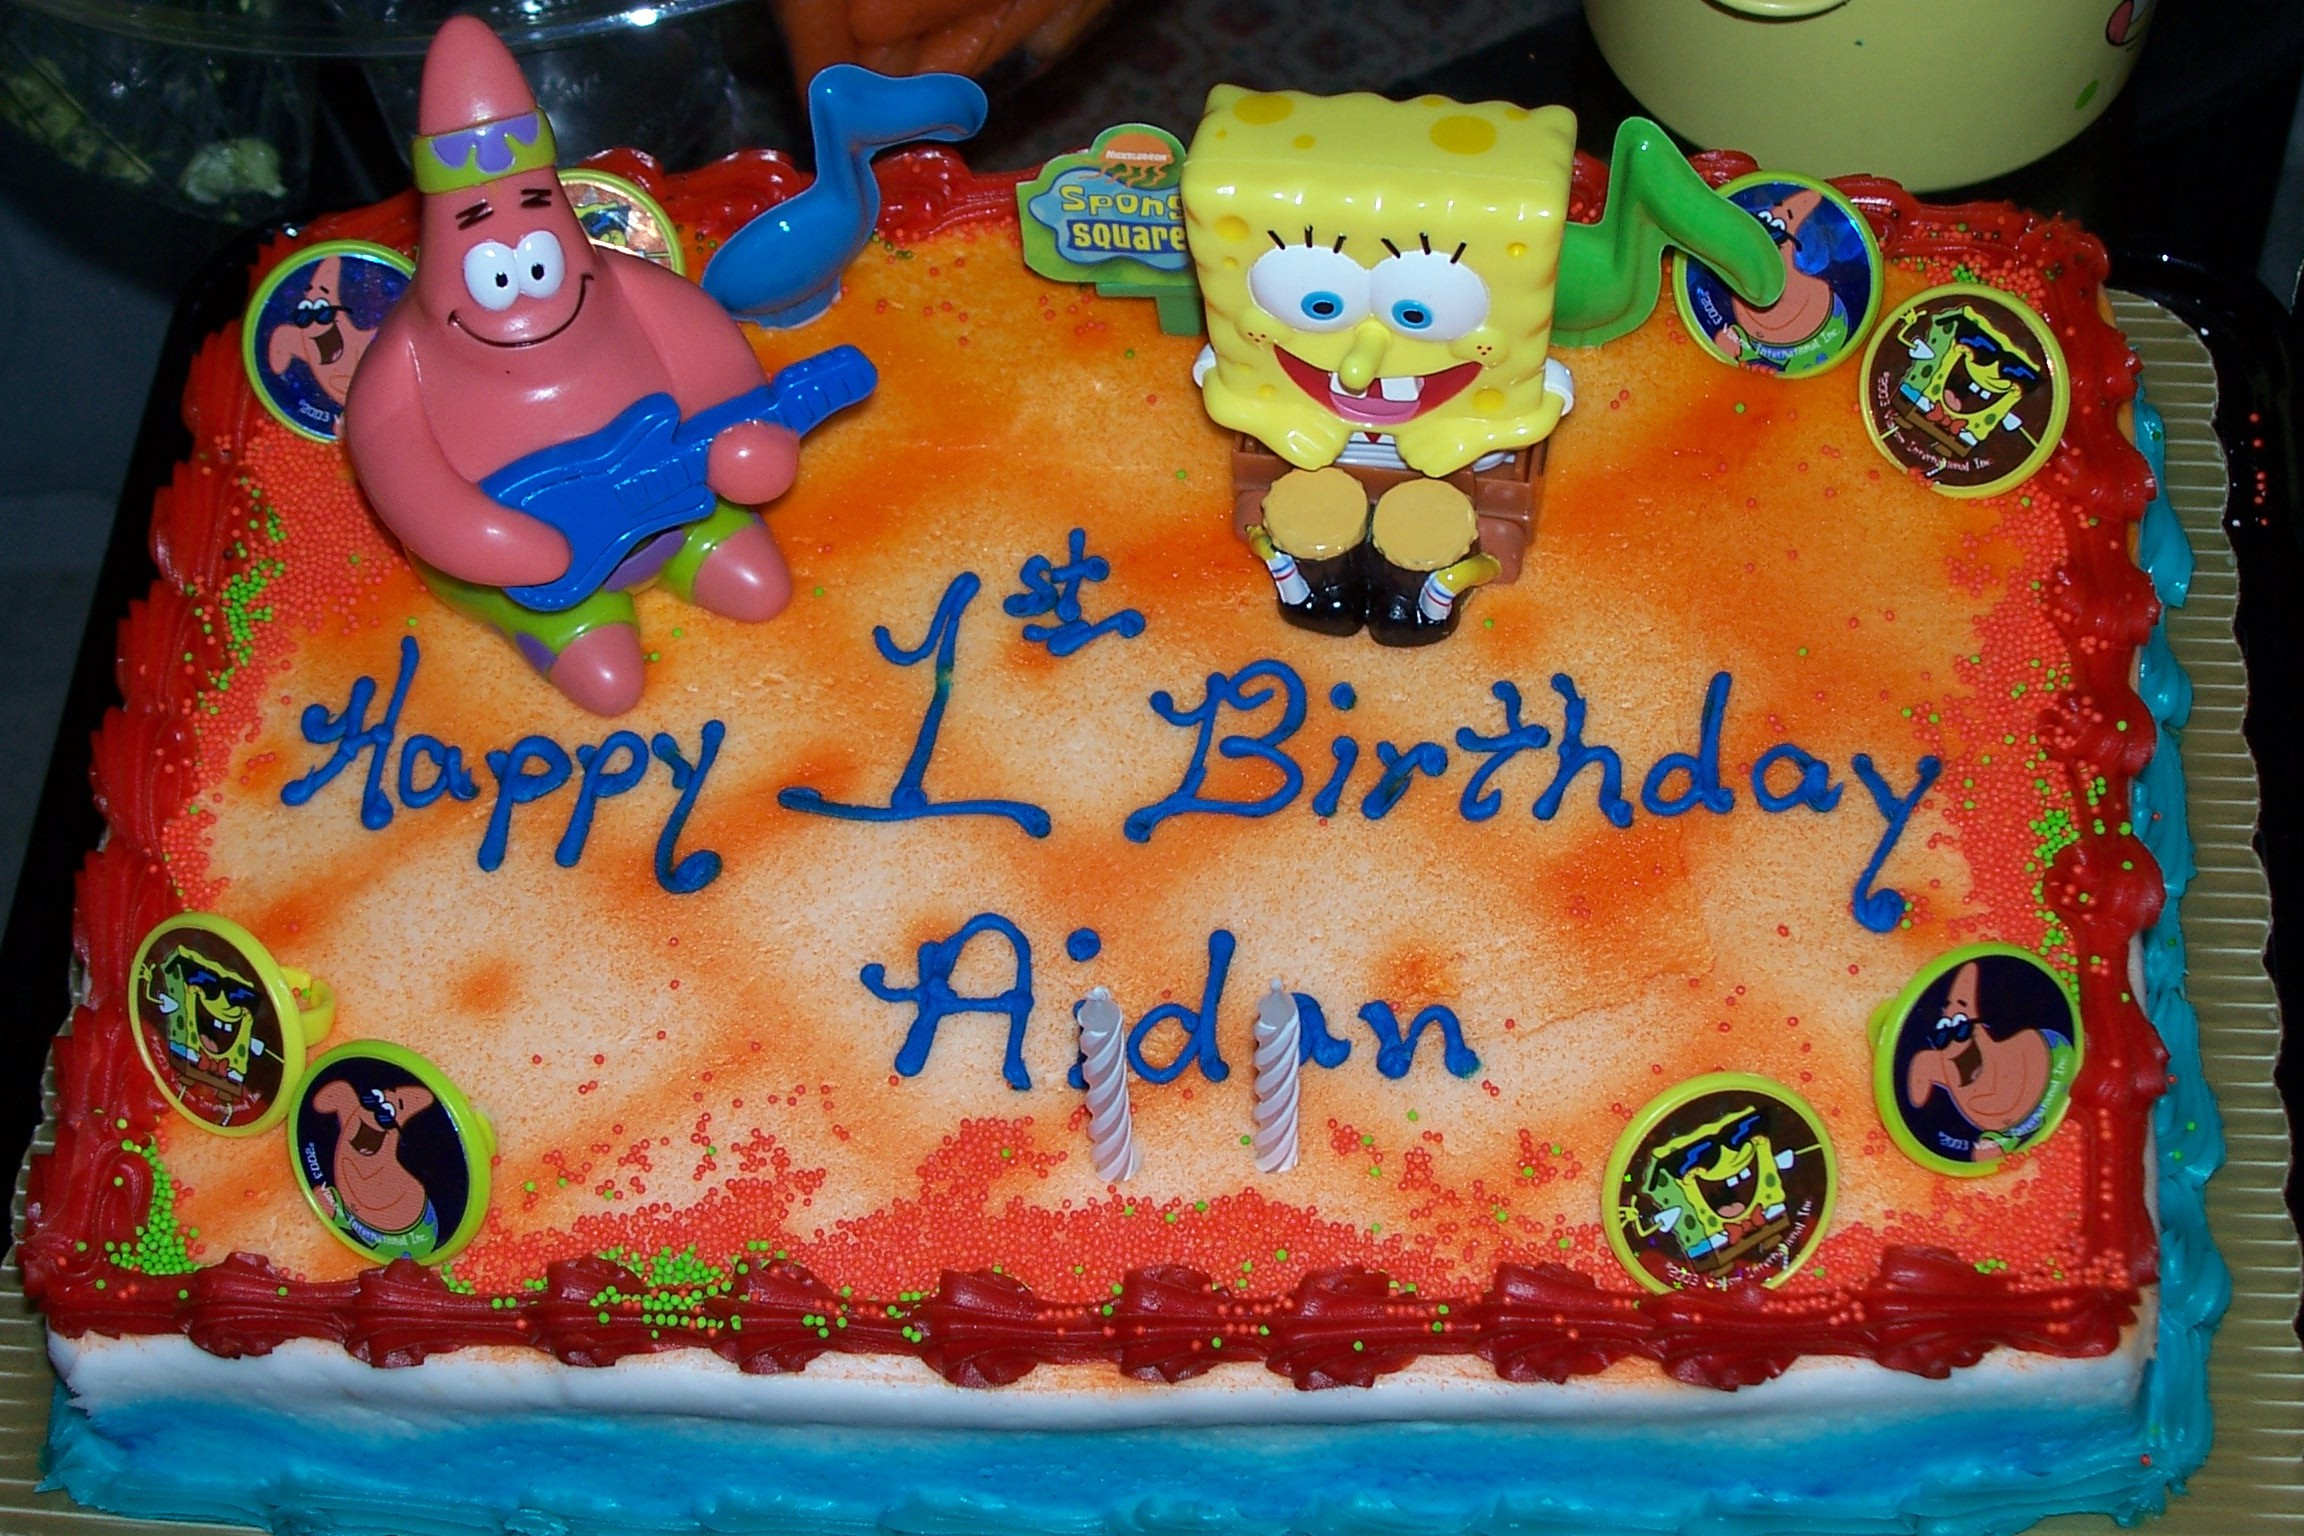 Wallpaper Spongebob Squarepants Birthday Cake On Desktop Com